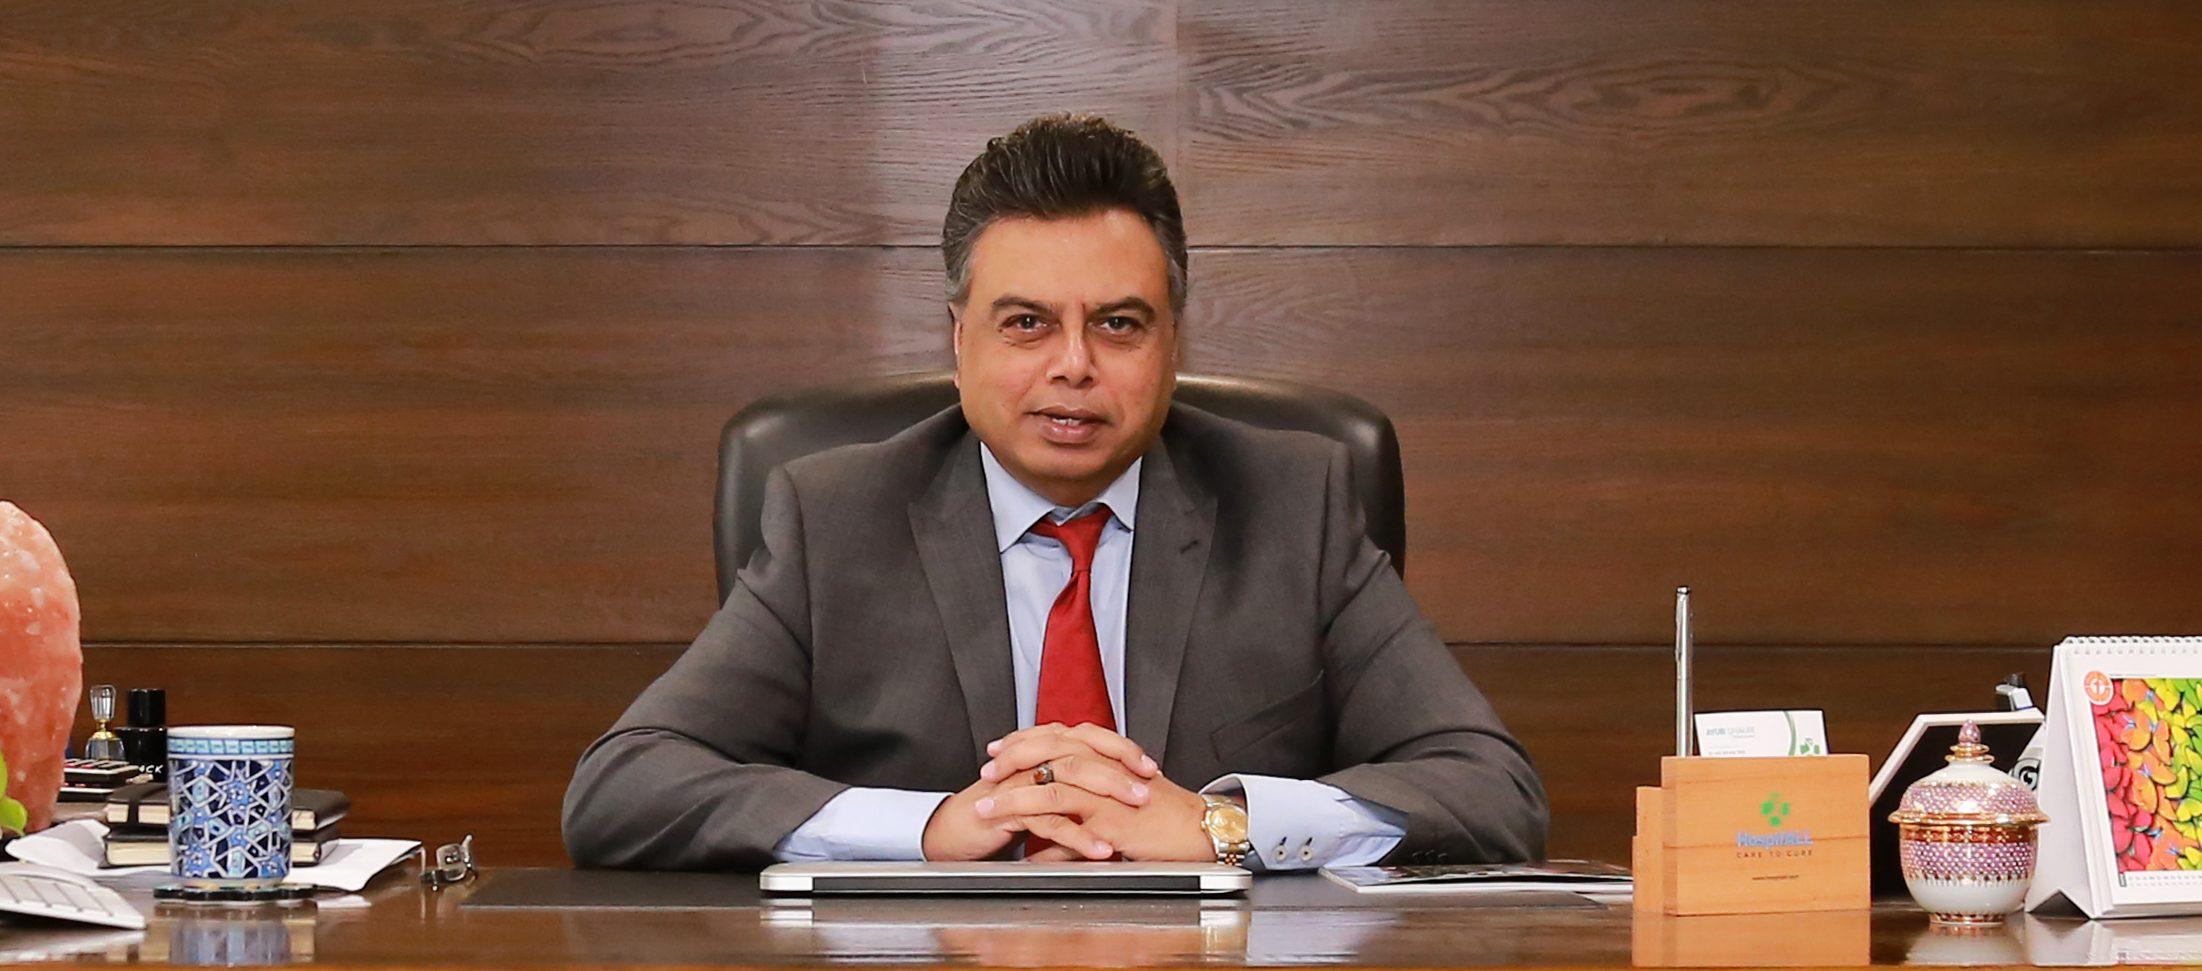 Mr. Ayub Ghauri (Executive Director- NetSol Technologies) | evolvemagazine